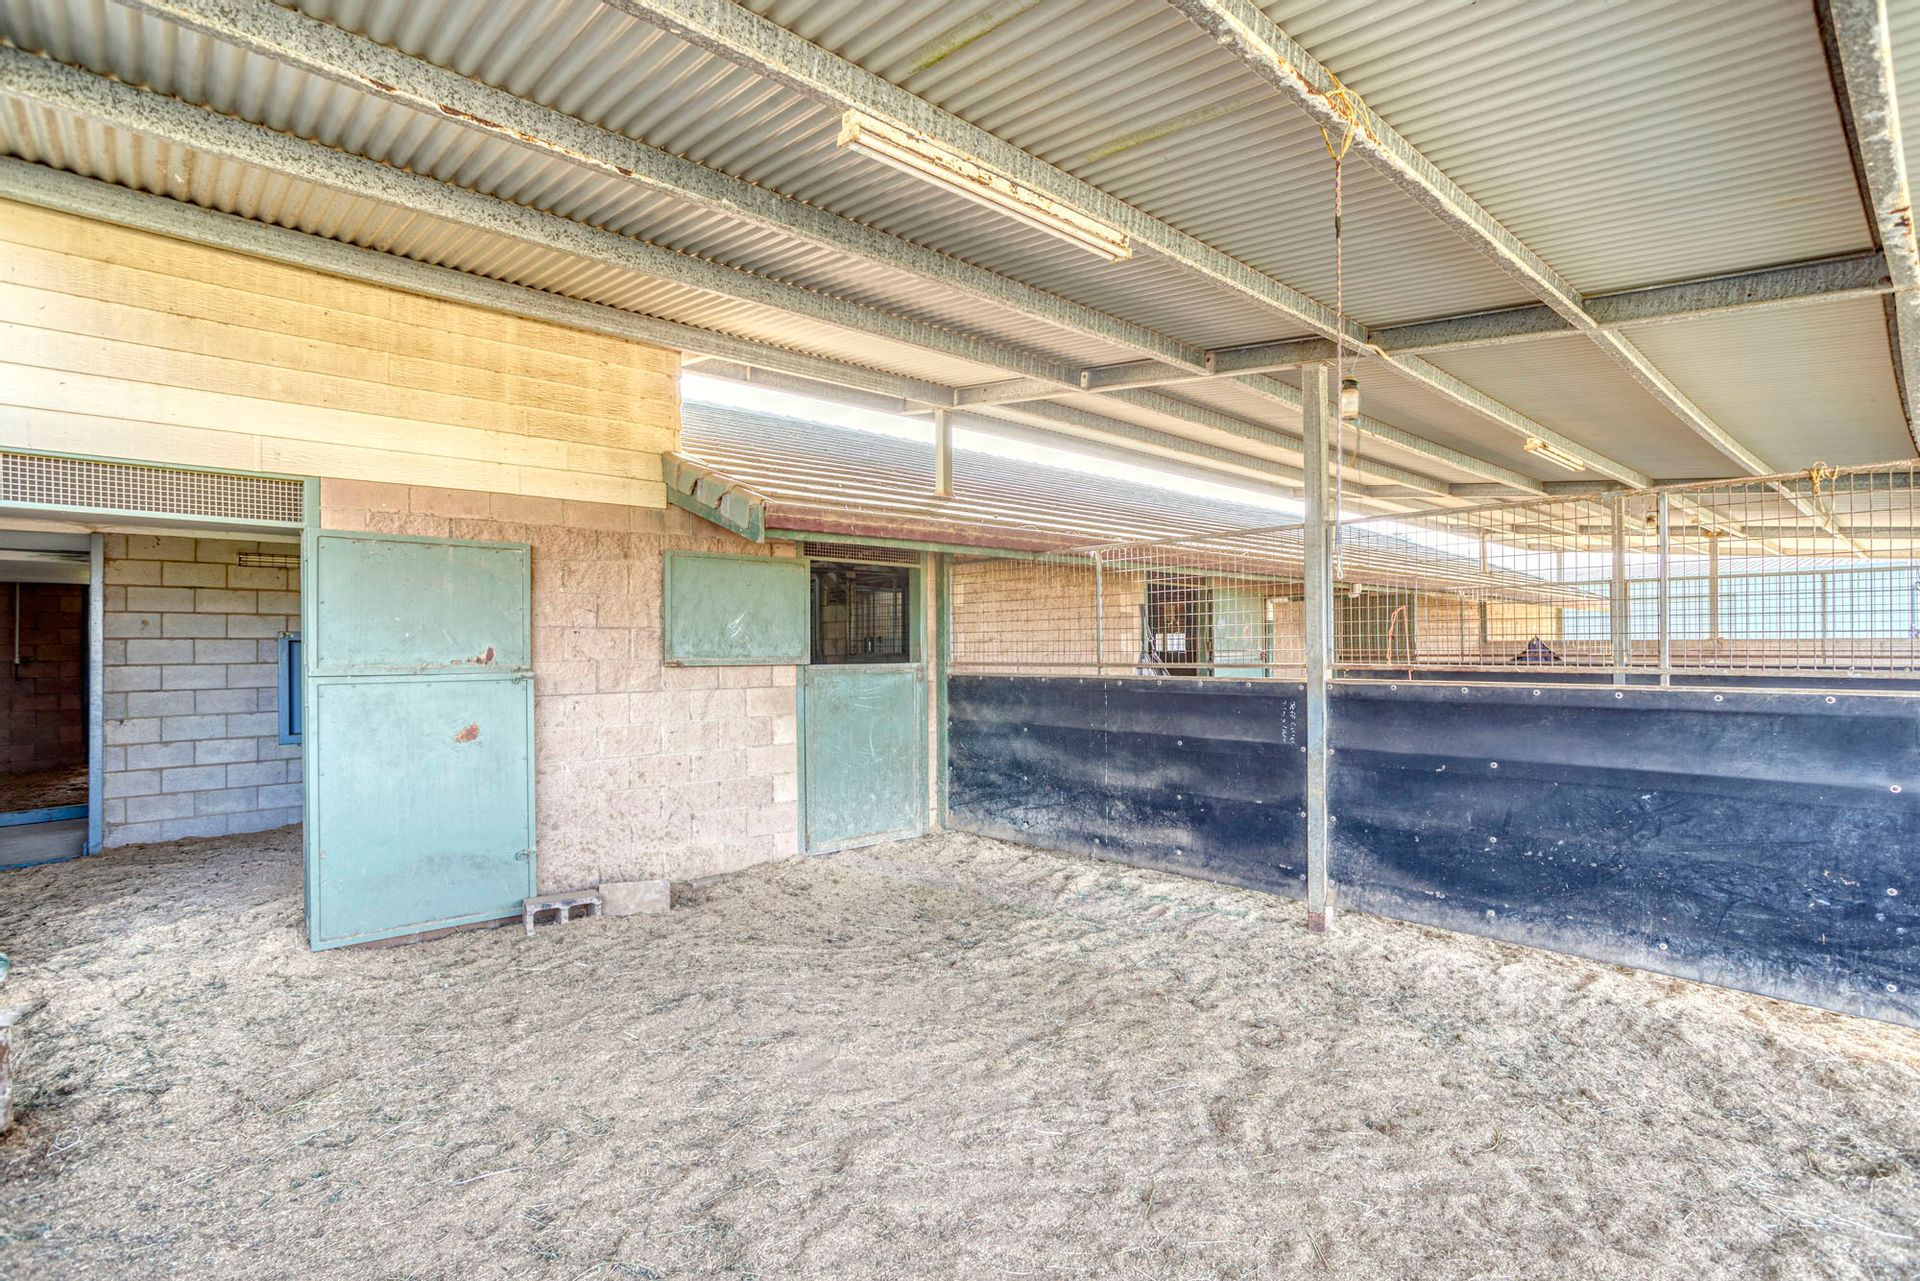 920 Eumundi-Kenilworth Road, Belli Park, QLD  4562